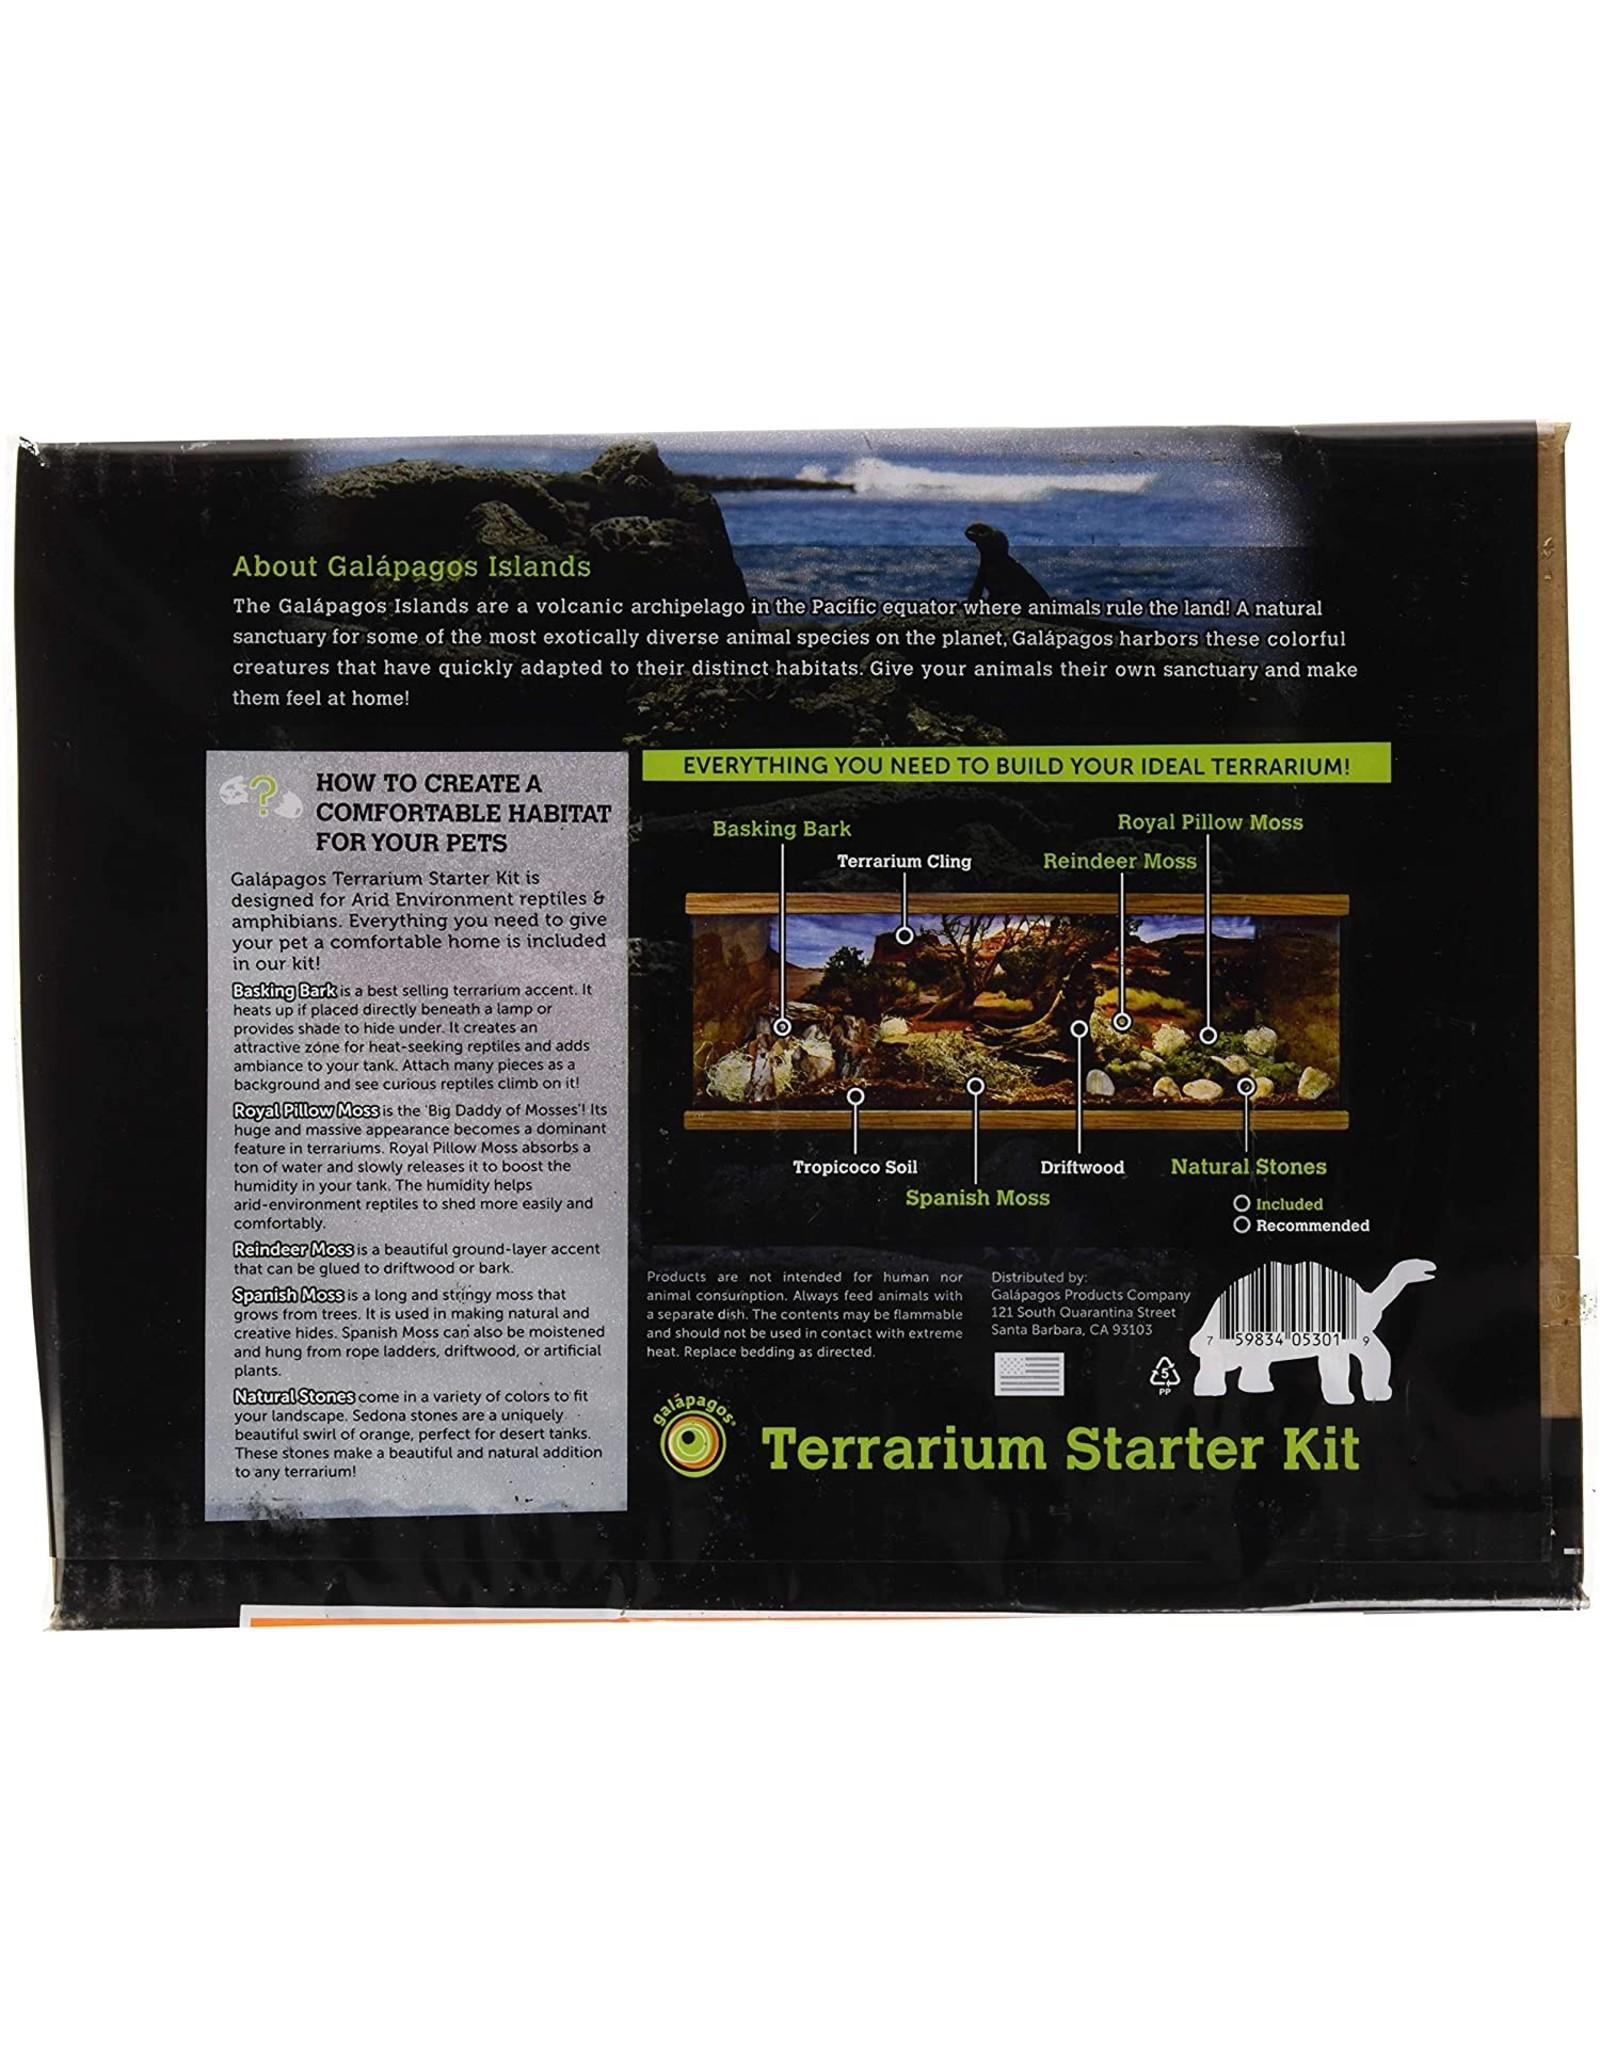 Galapagos GALAPAGOS Terrarium Starter Kit Arid Environment 4.5qt